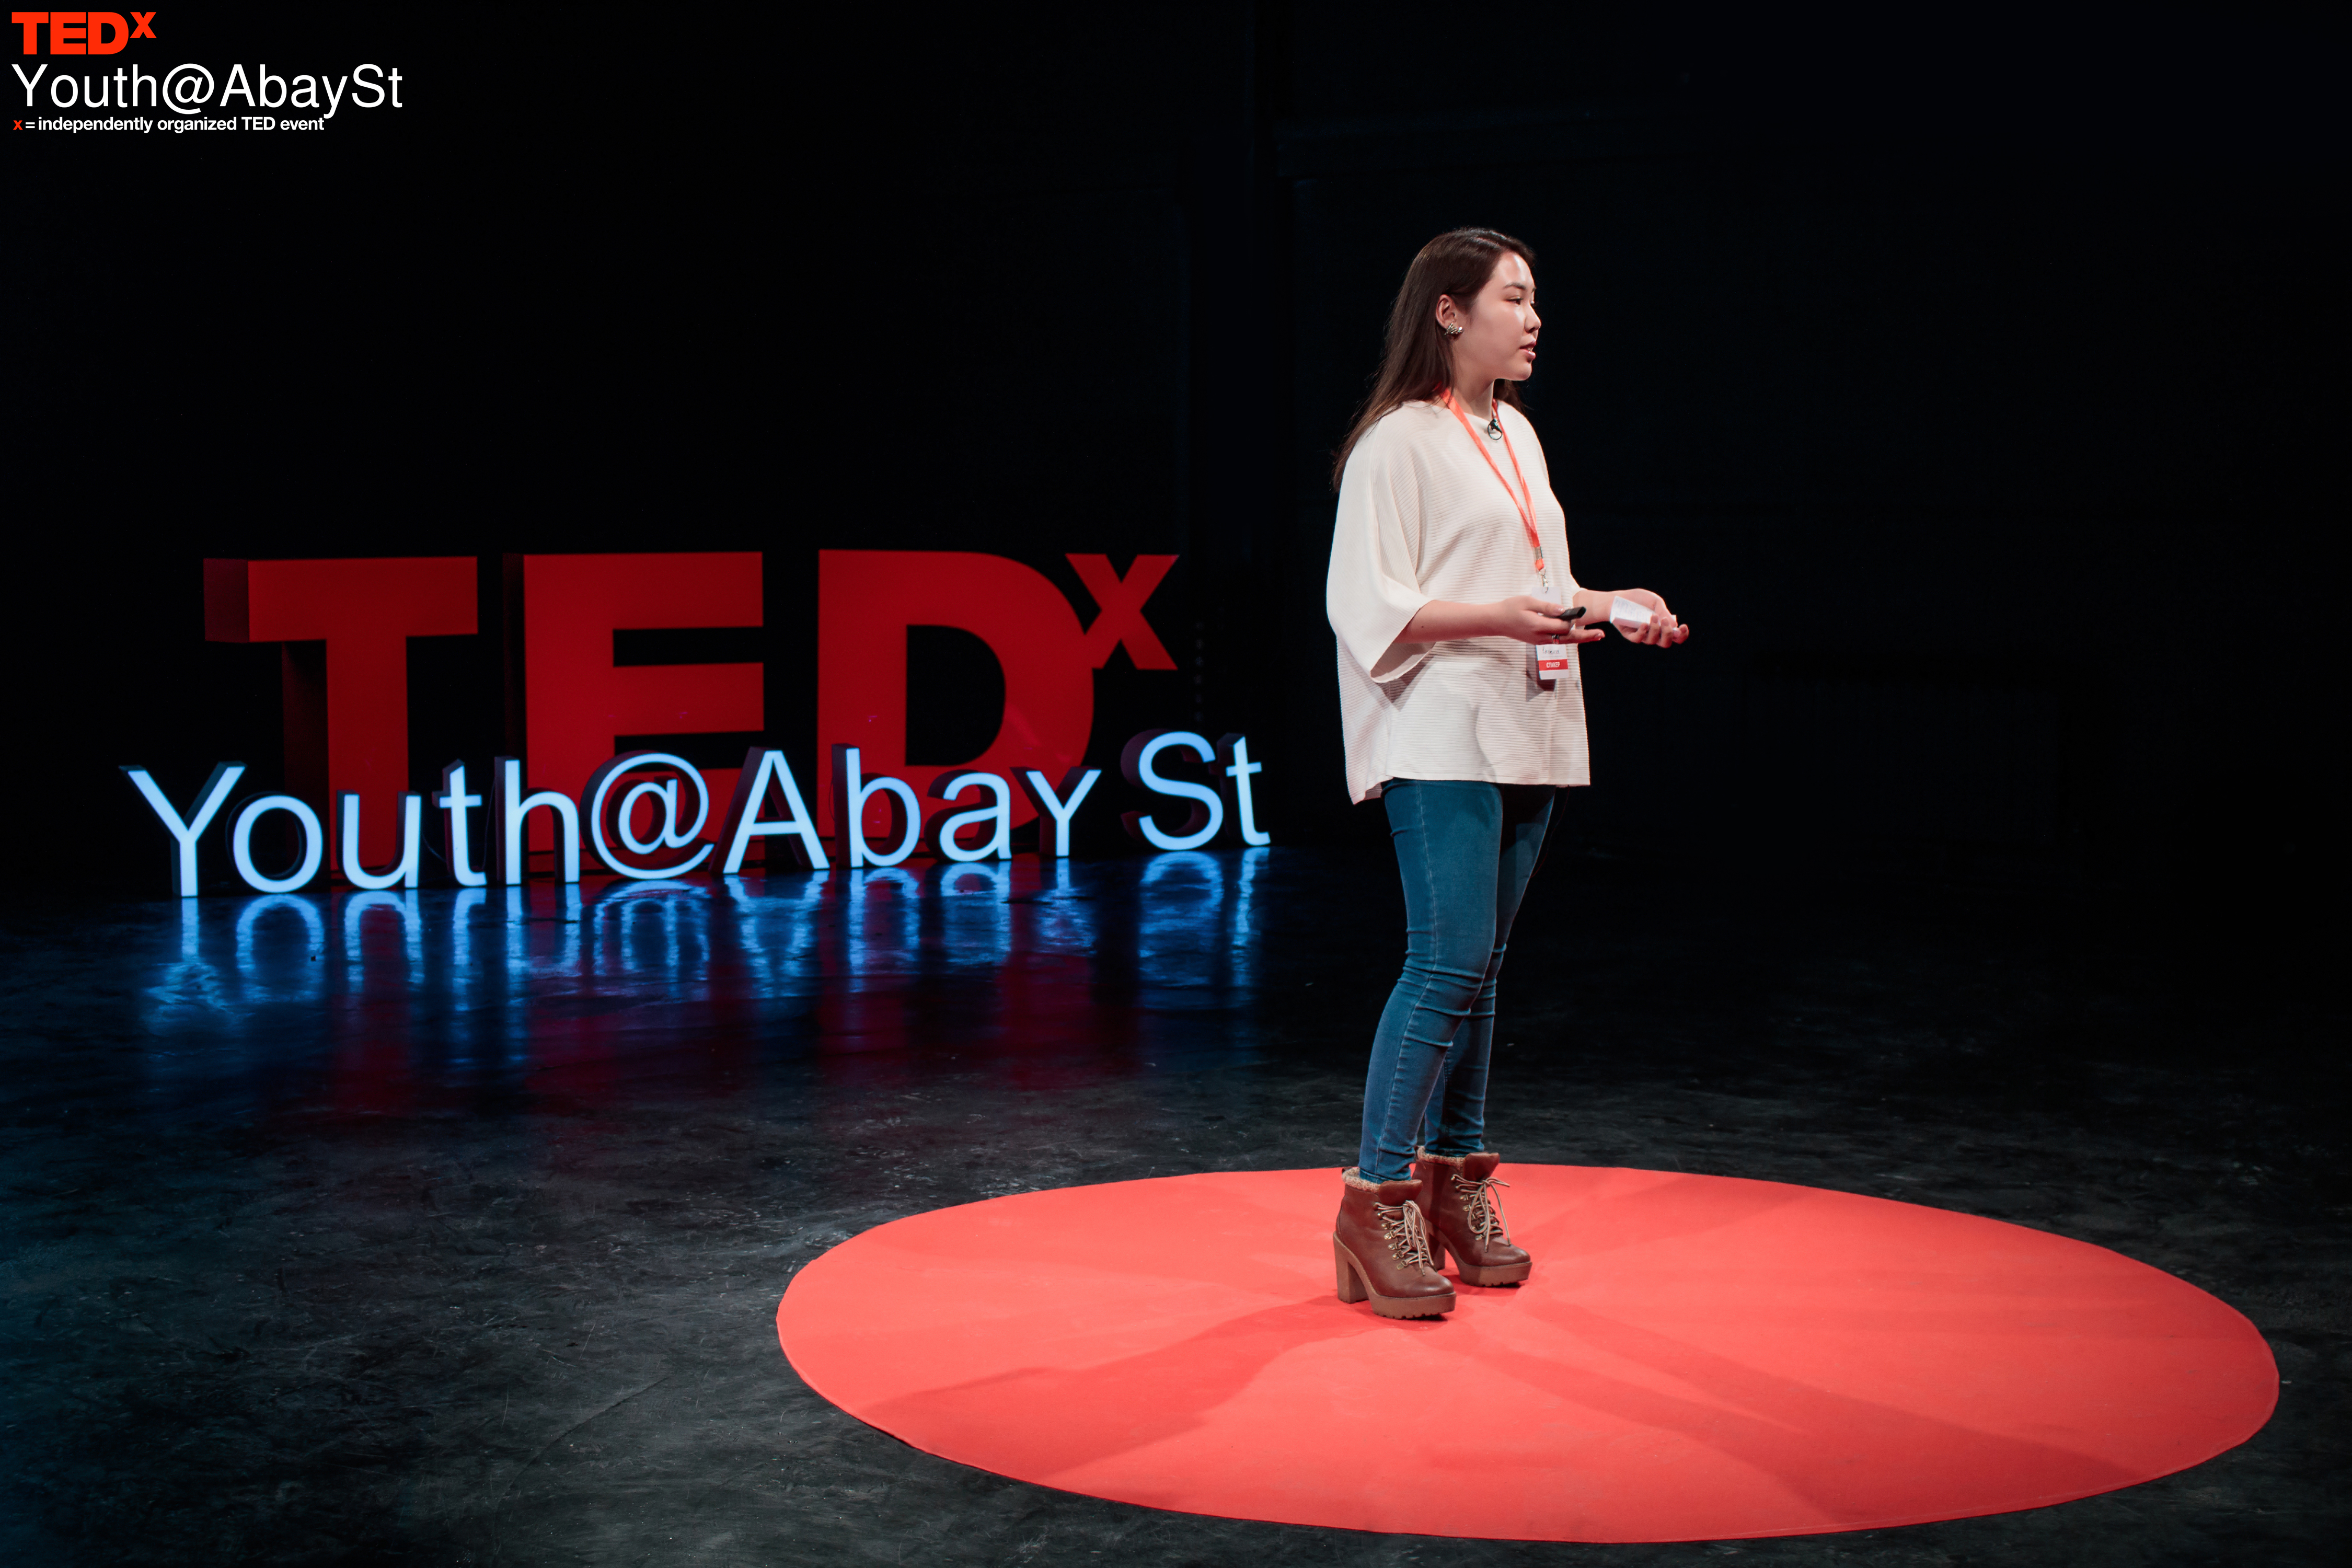 TEDxYouth@AbaySt